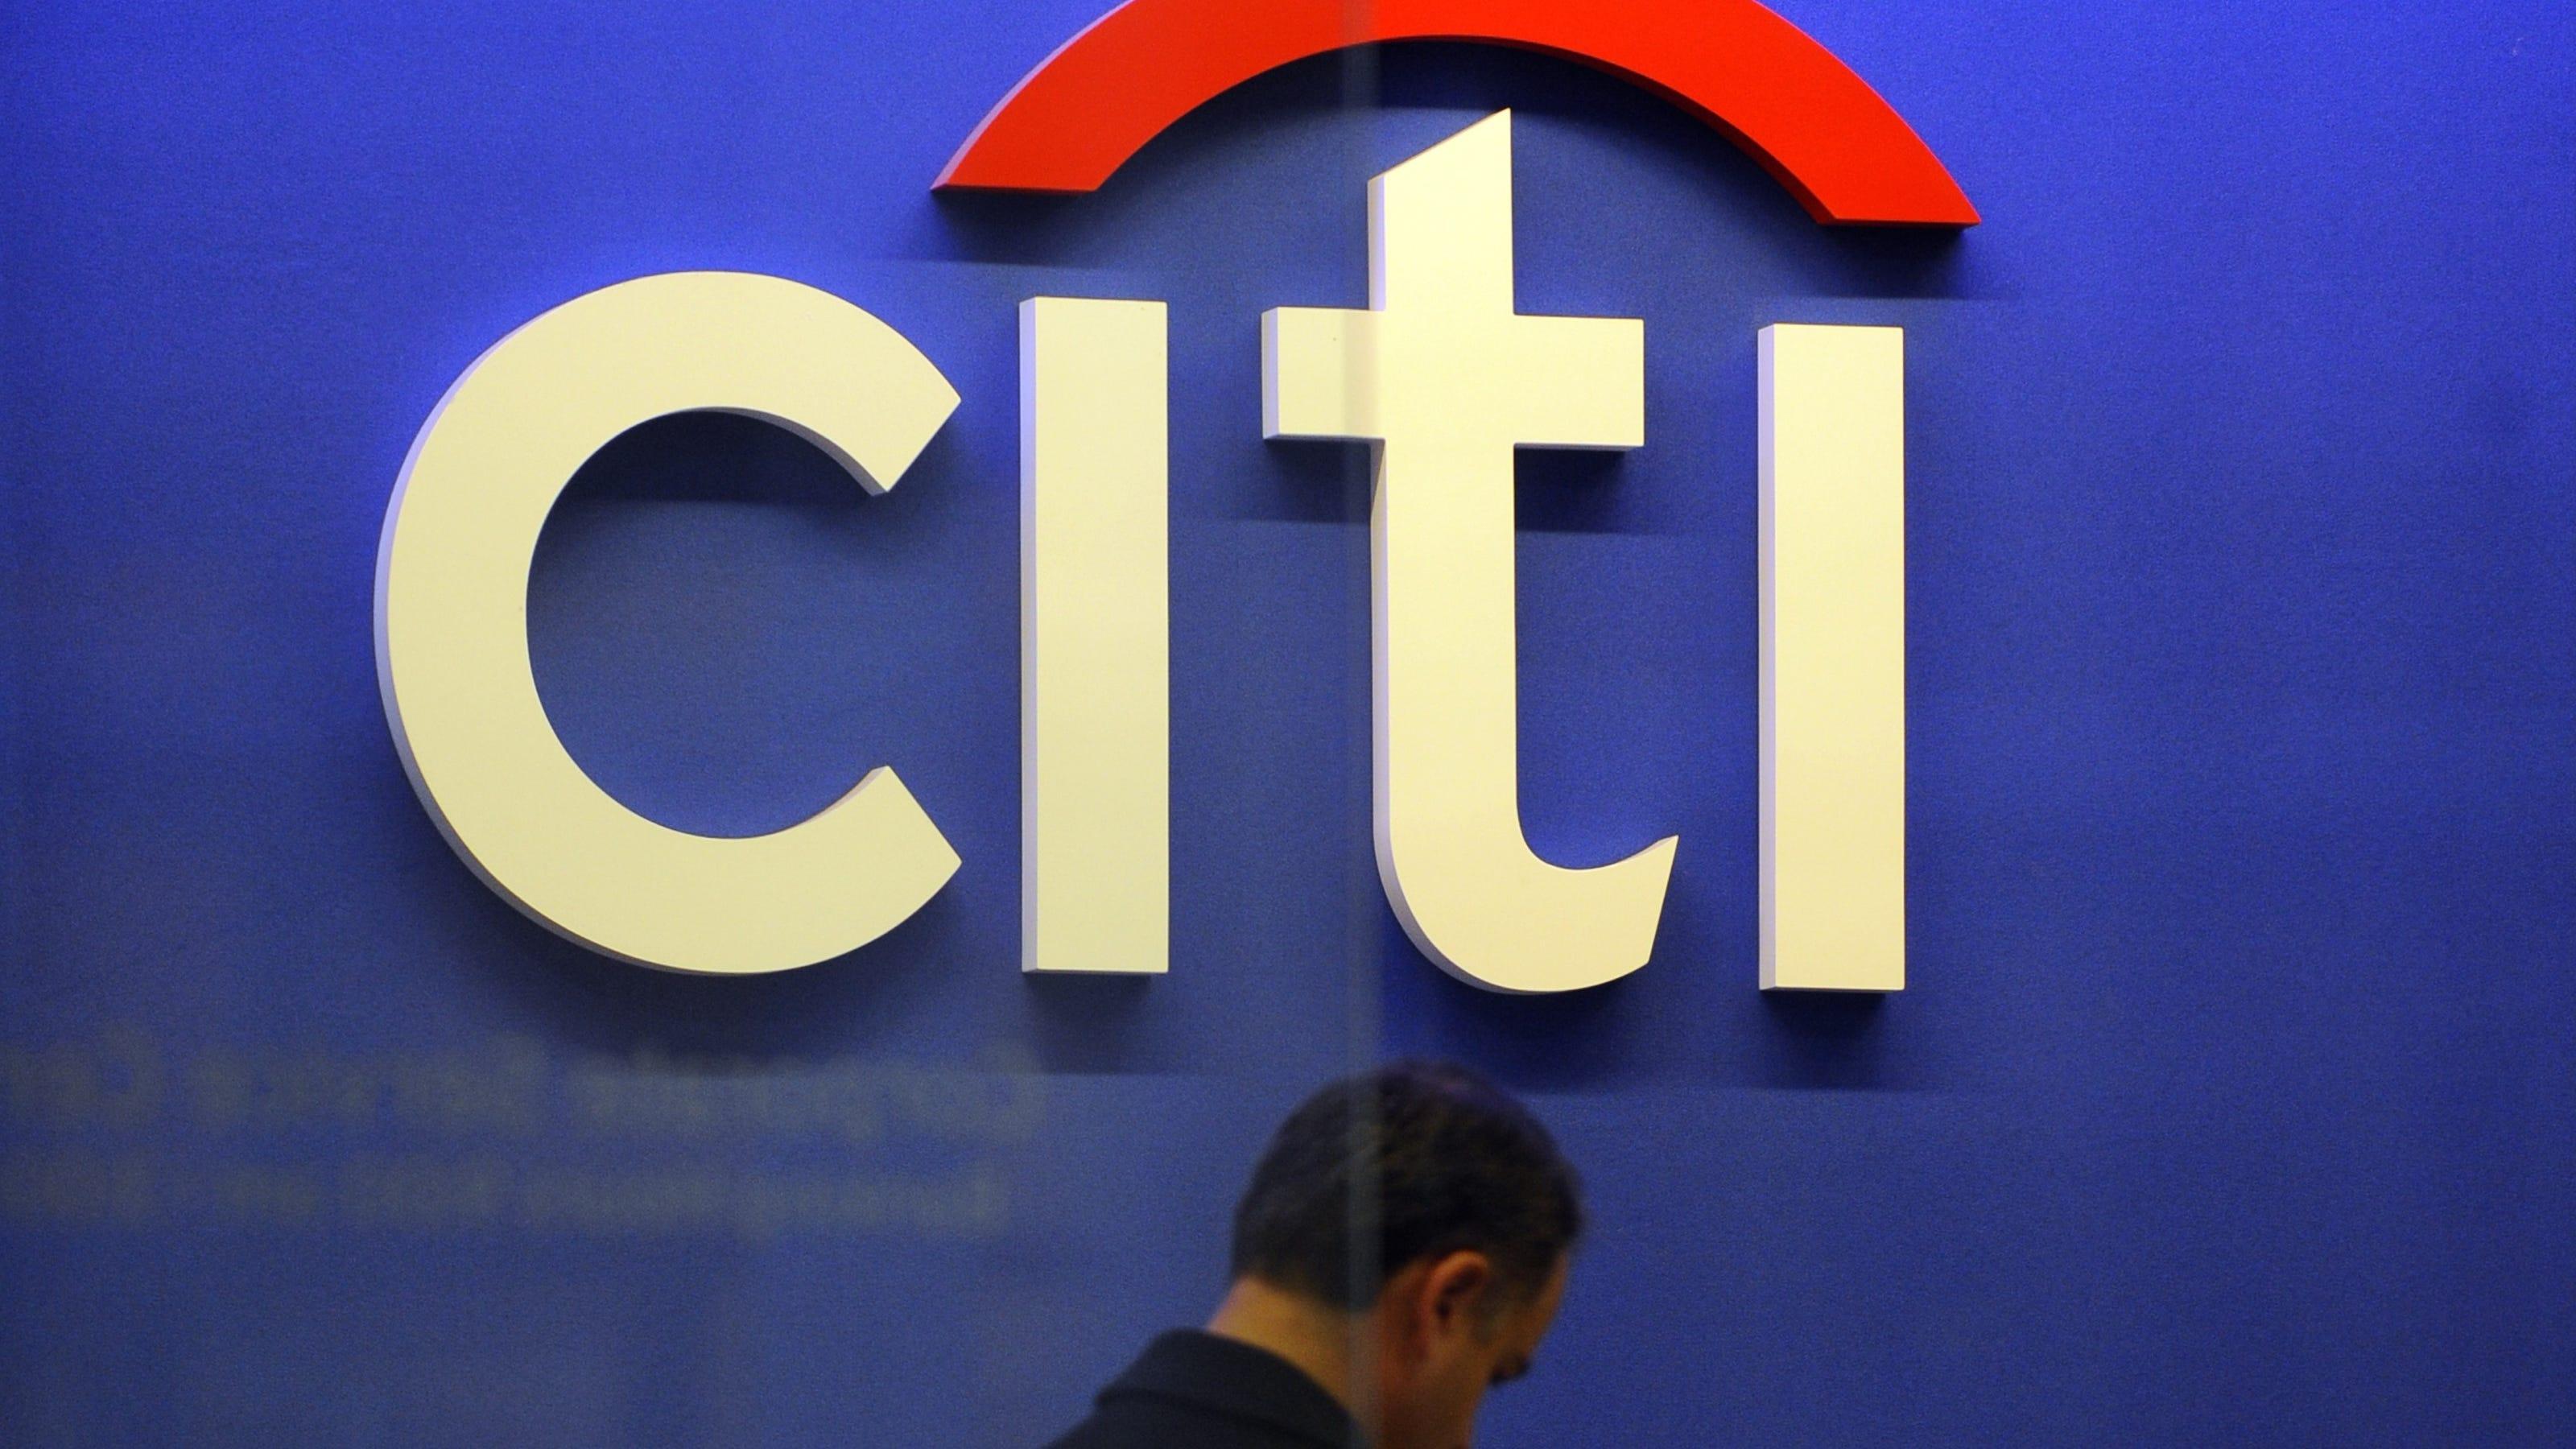 Citi Group Career 72